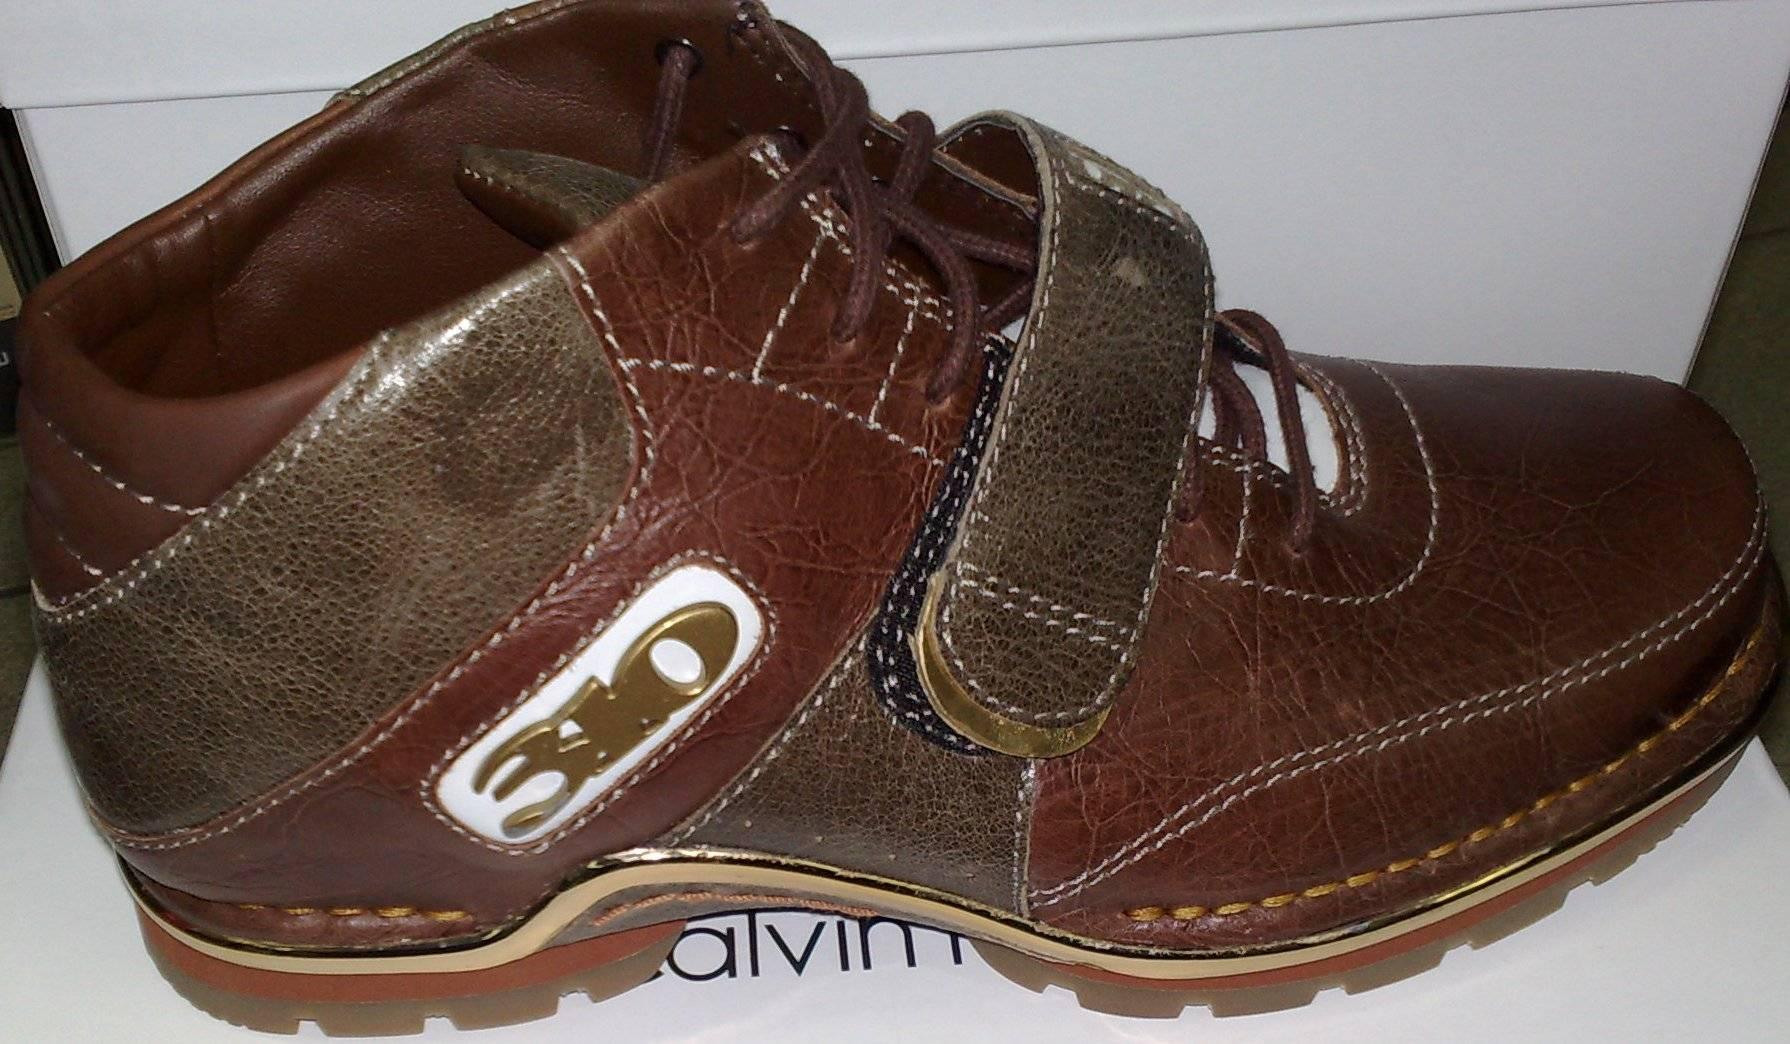 Sell 3T Motoring Footwear